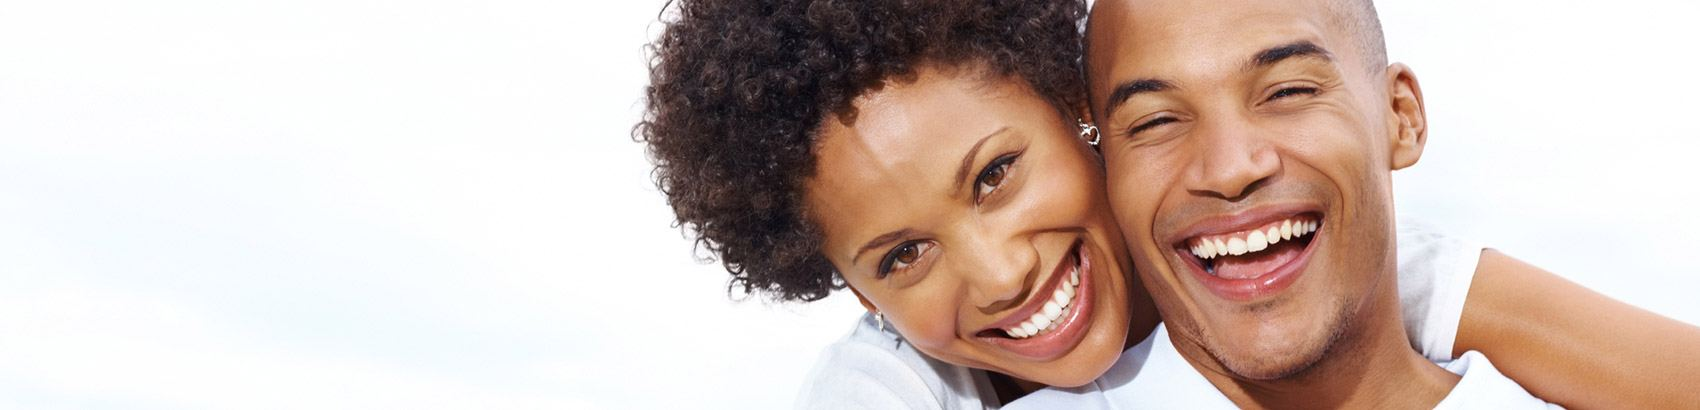 Dental Bridges - Asuncion Dental Group